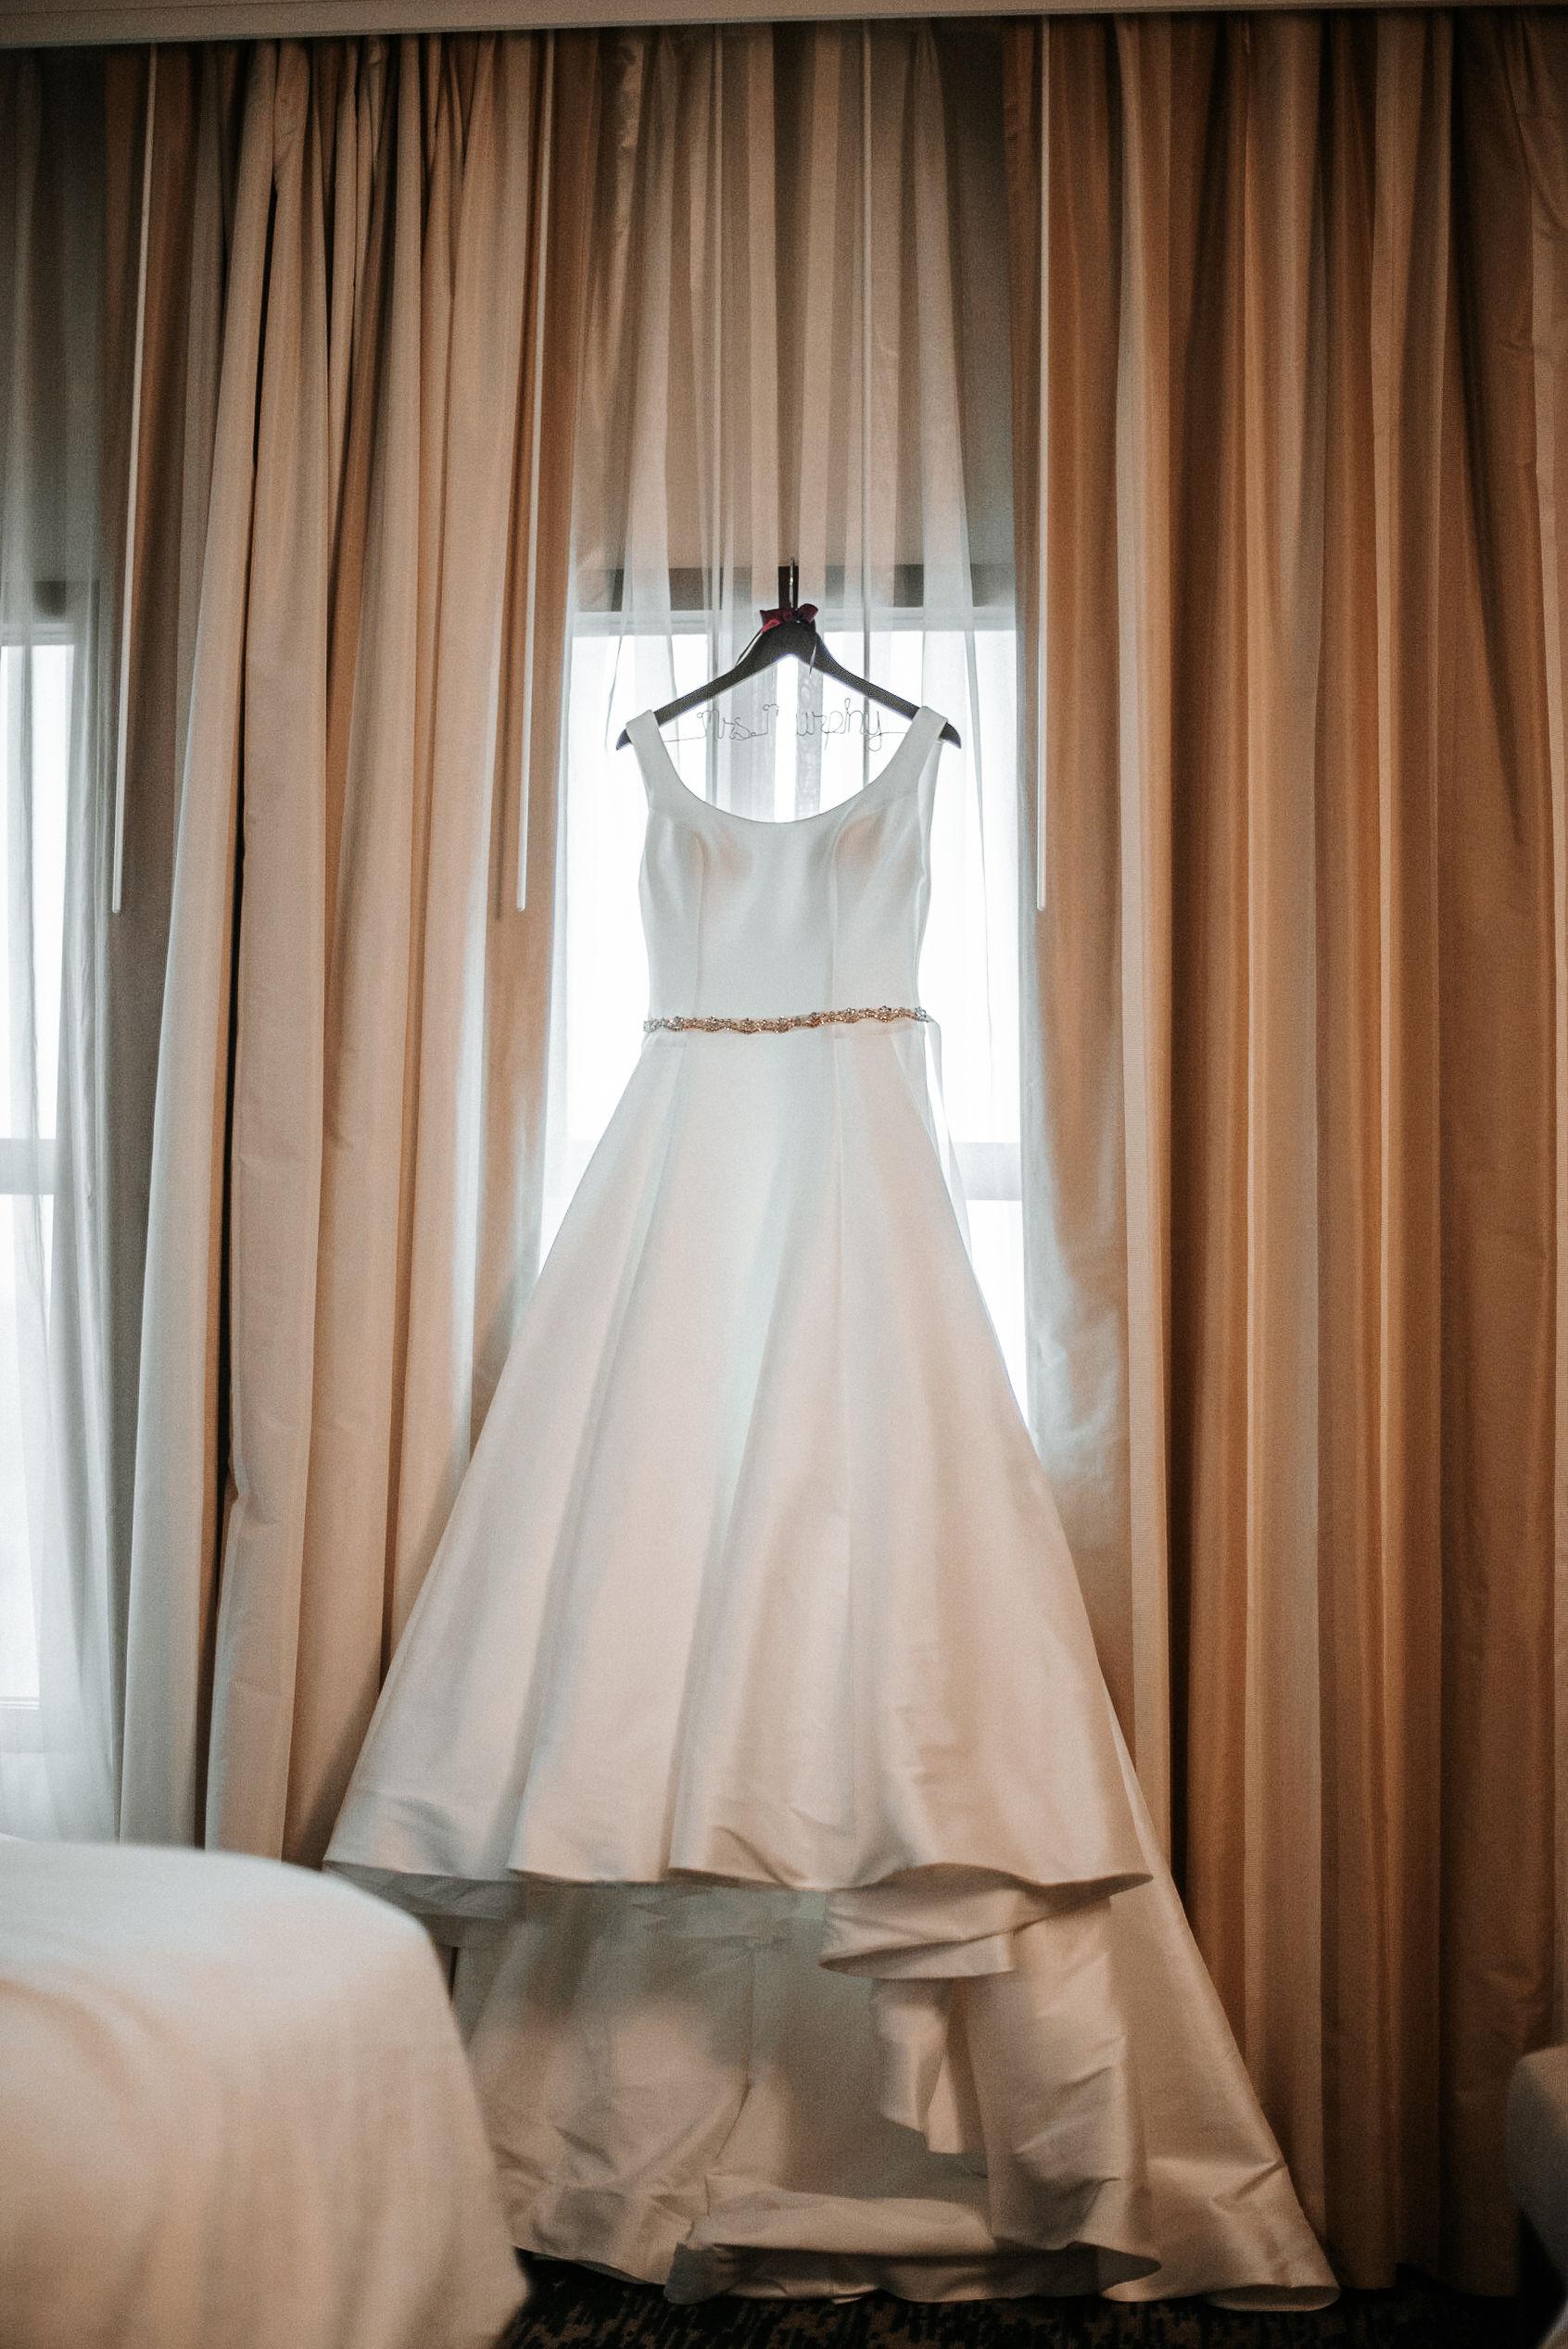 detail shot of bride's wedding dress The George Washington Masonic National Memorial